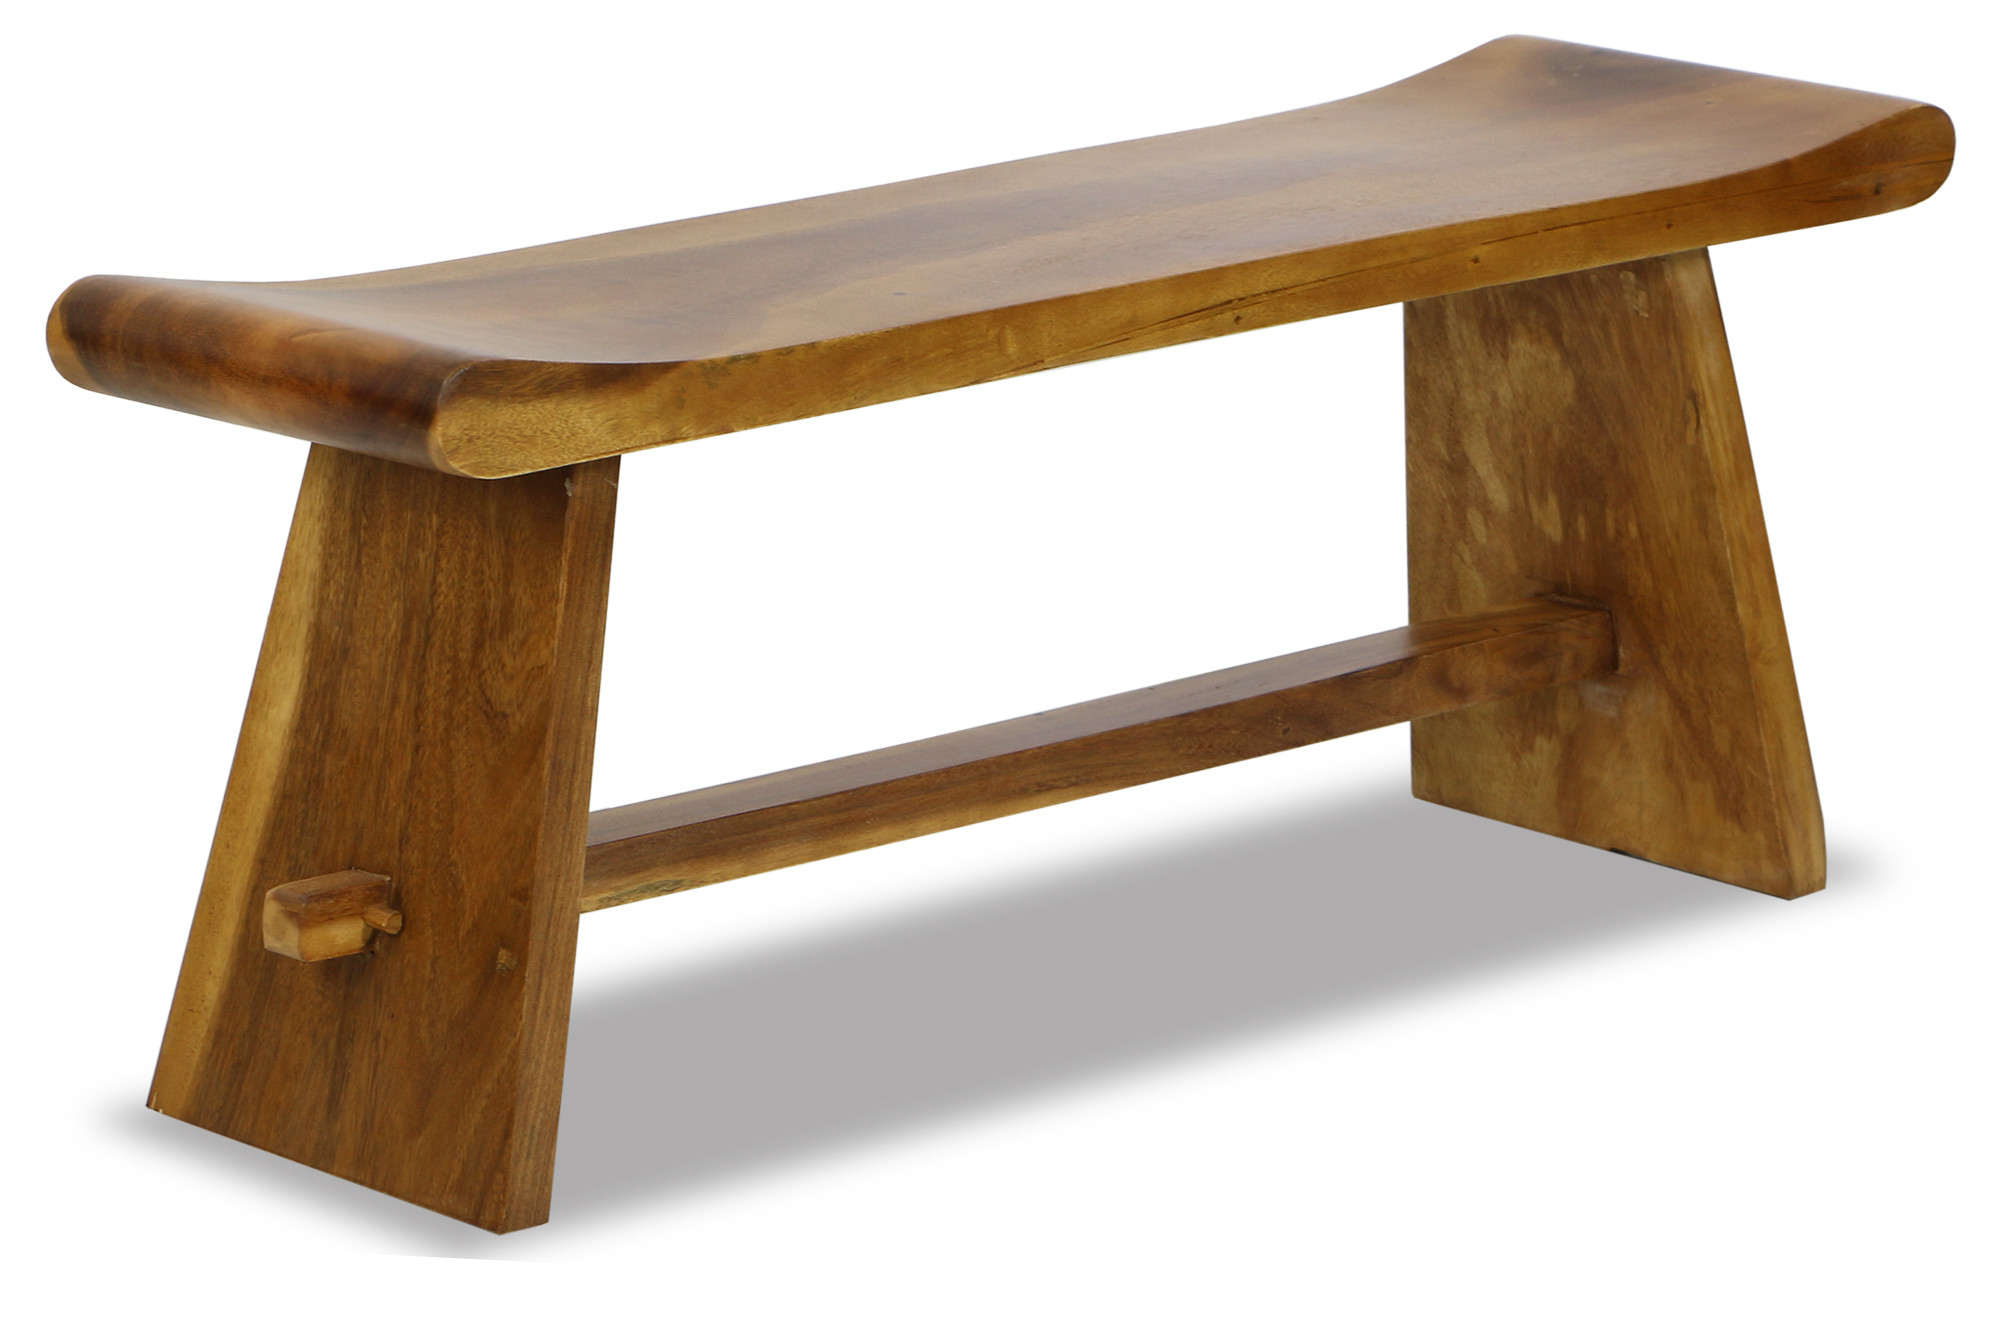 Pretoria Wooden Bench